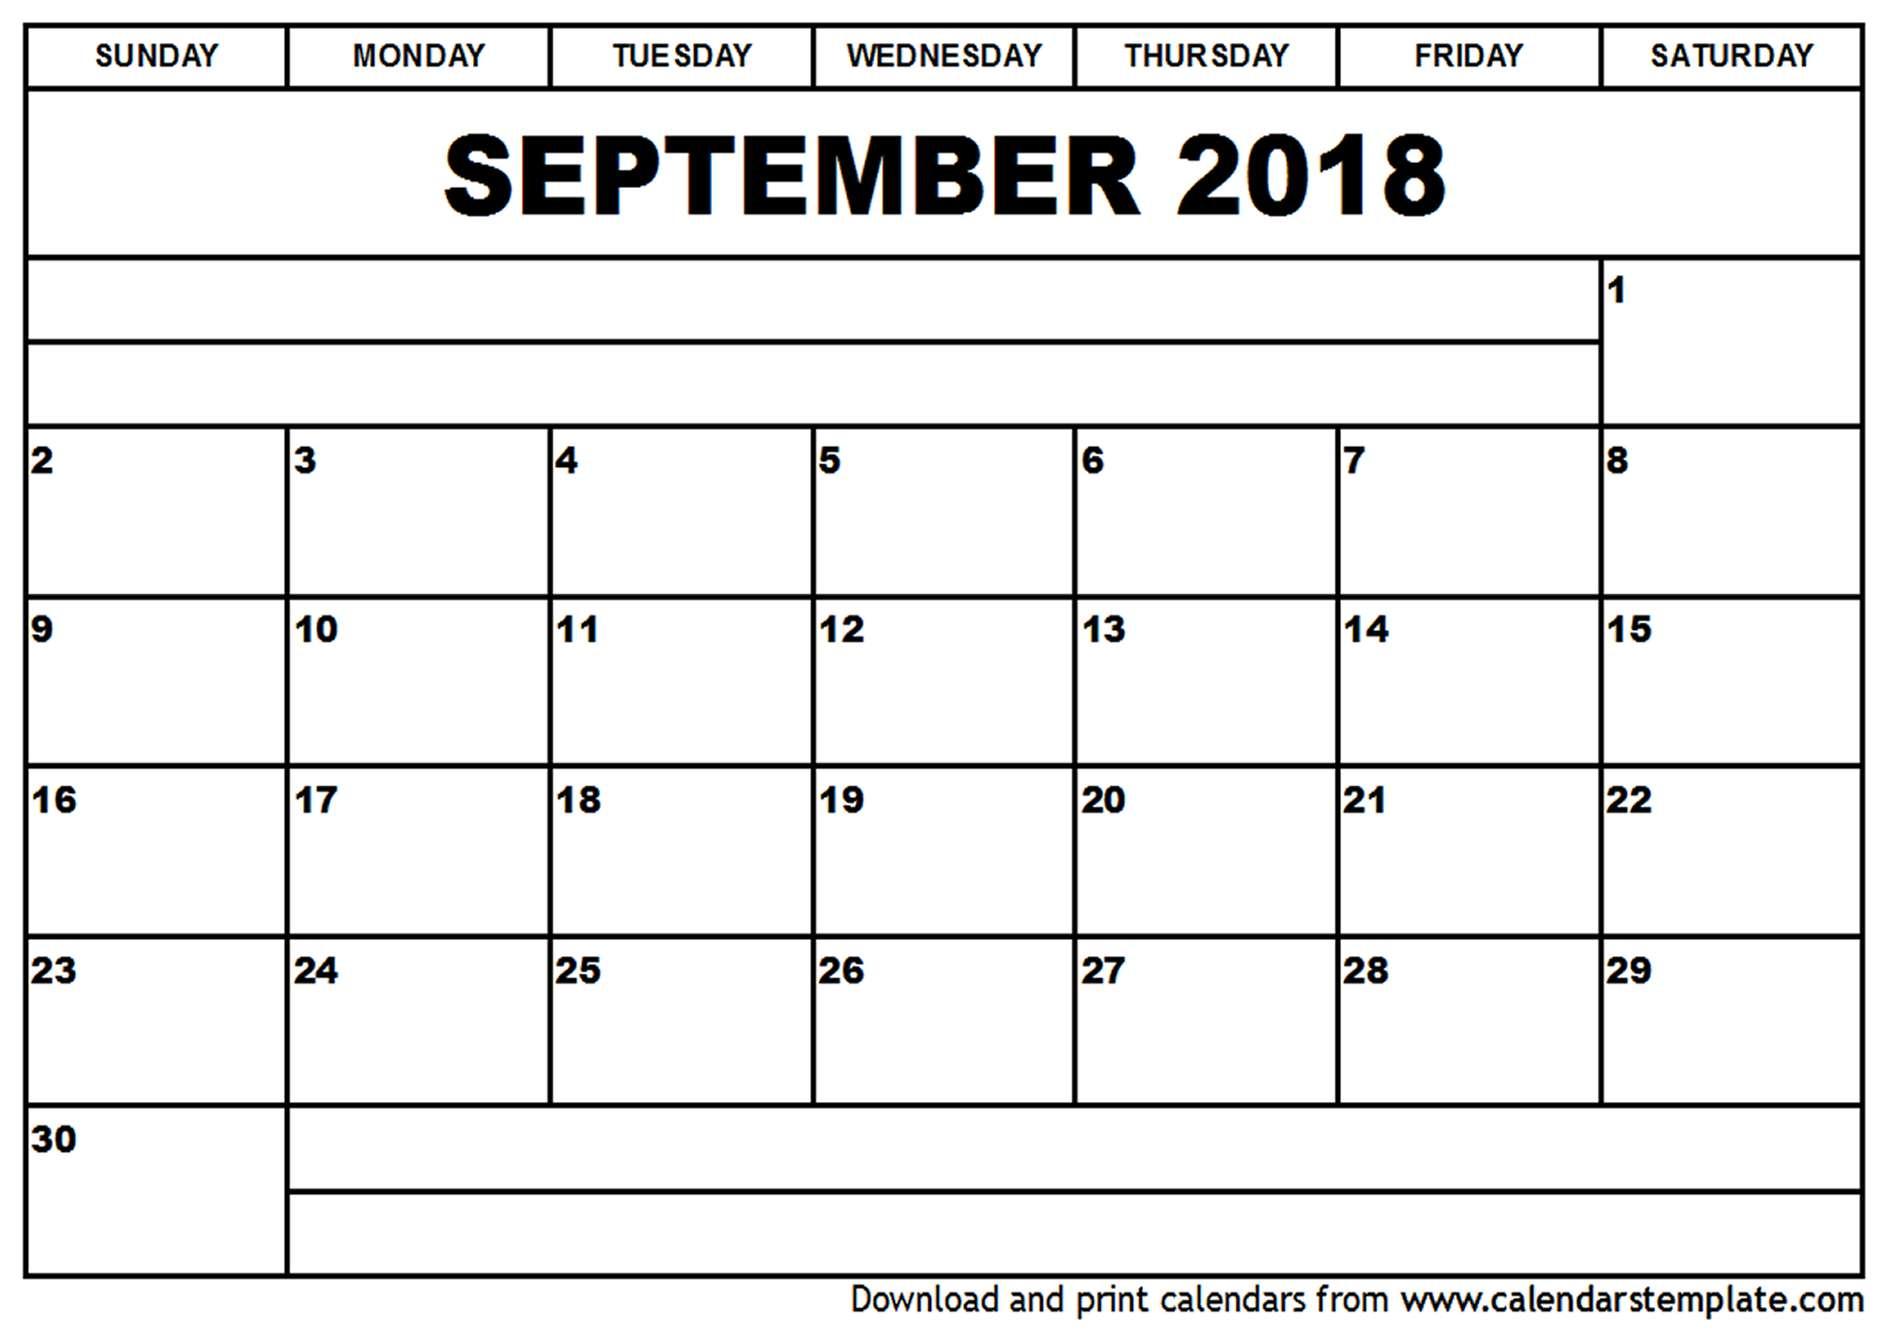 September 2018 Tamil Calendar